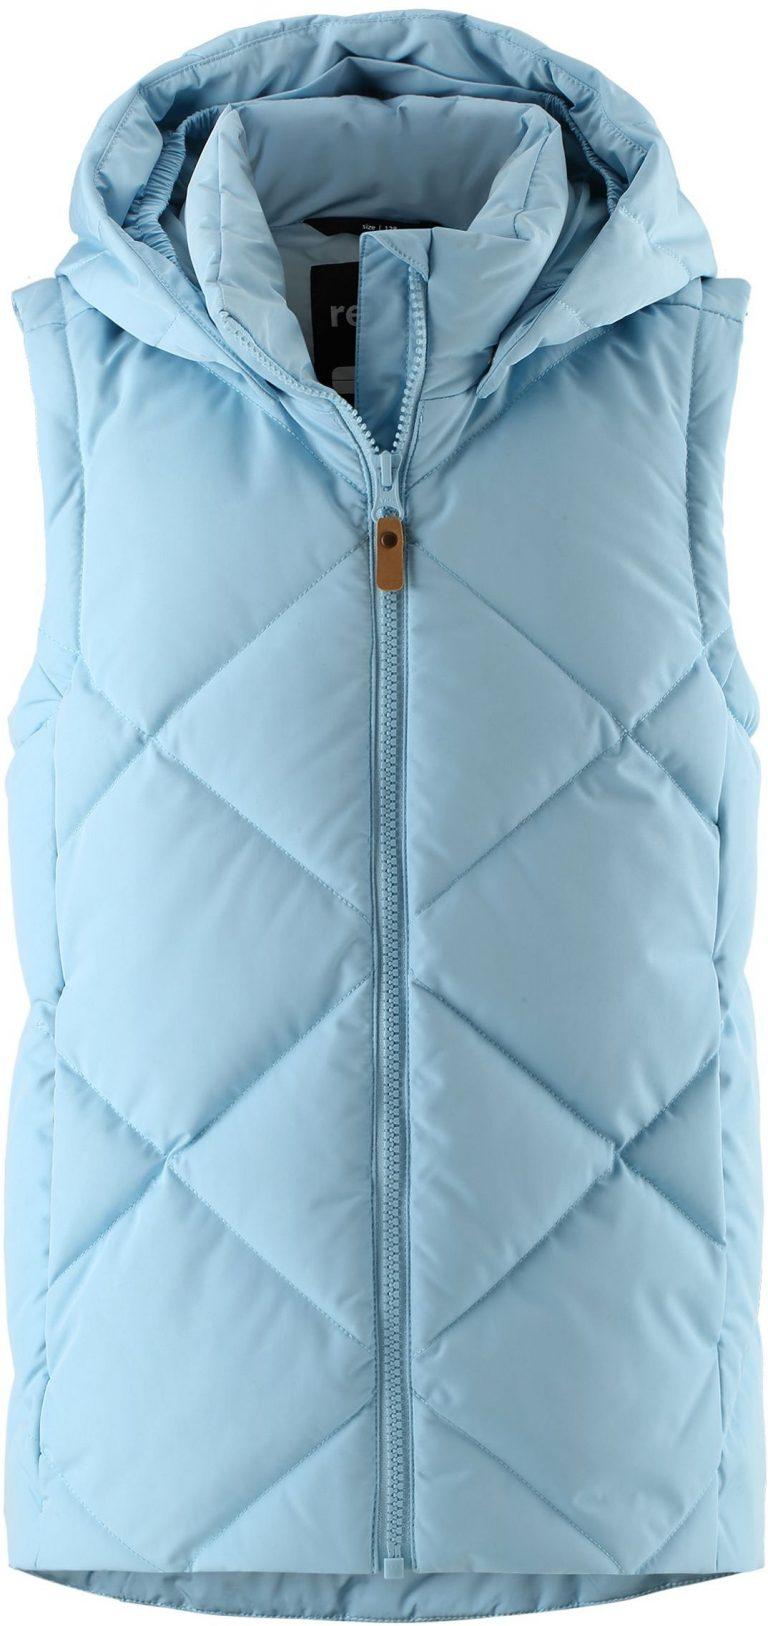 531484-6180 Reima Heiberg blue dream dievcenska zimna paperova vesta bunda